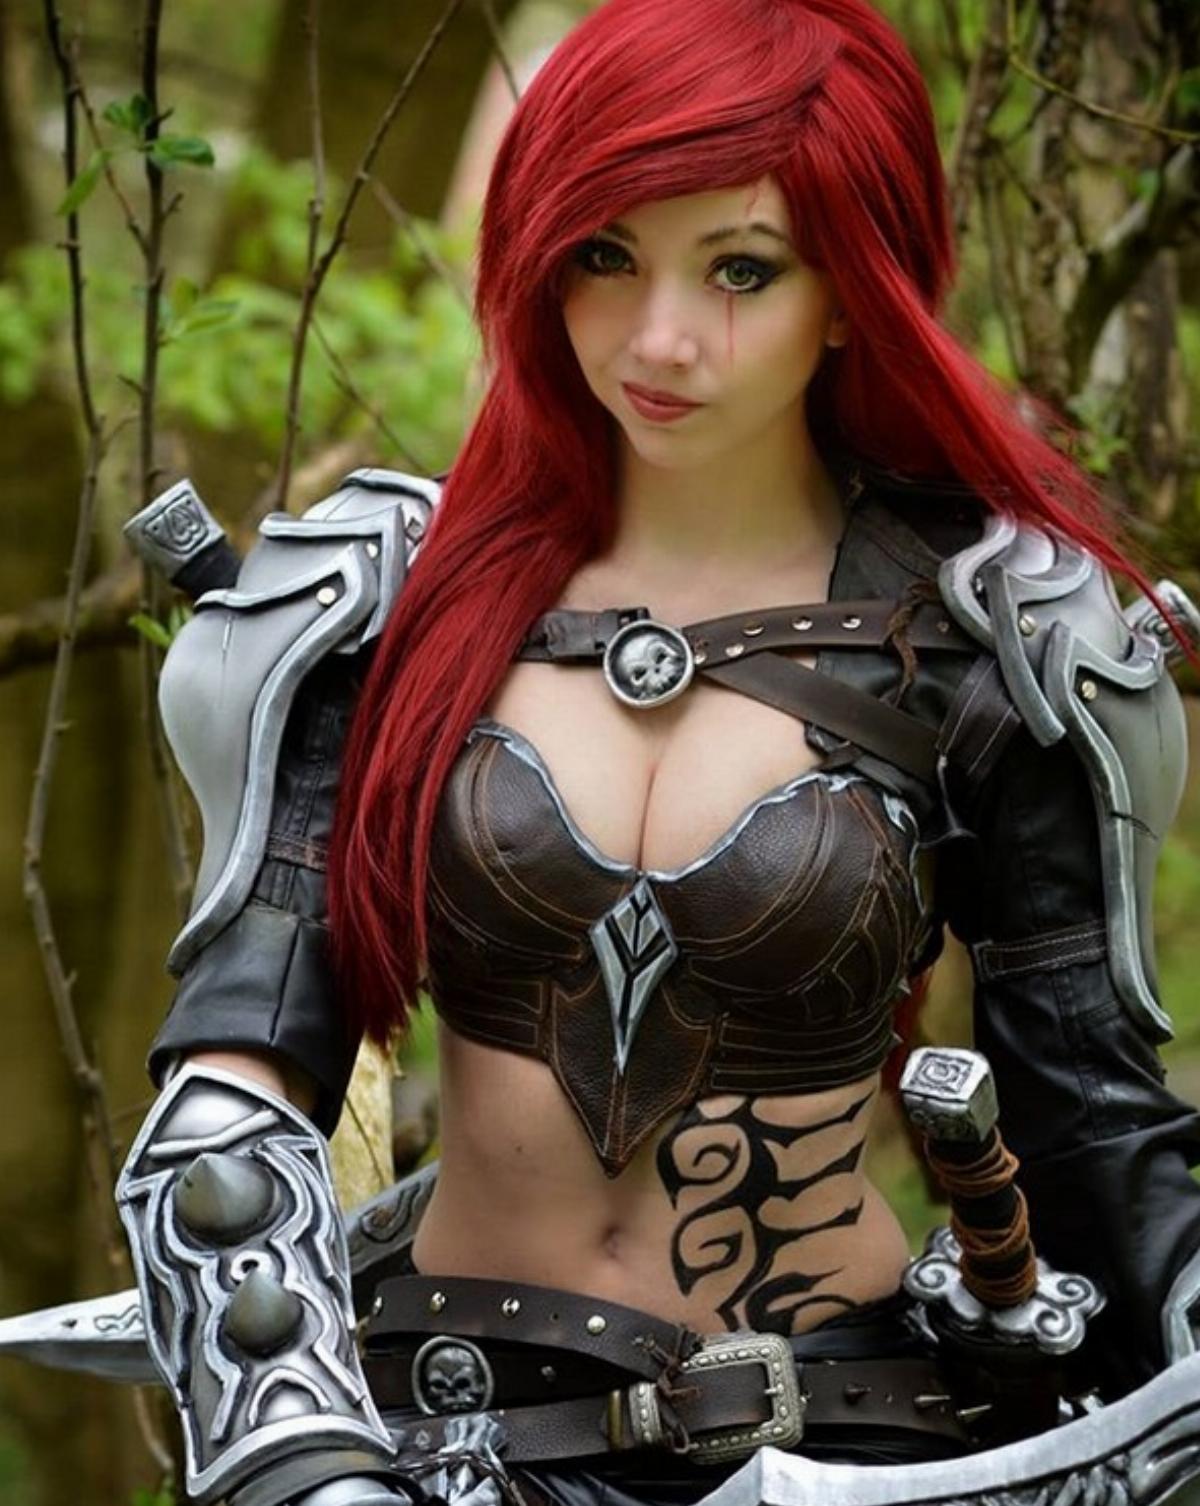 коспелй по overwatch, косплей, игровой косплей, косплей по League of Legends, Andrasta, косплей по World of Warcraft